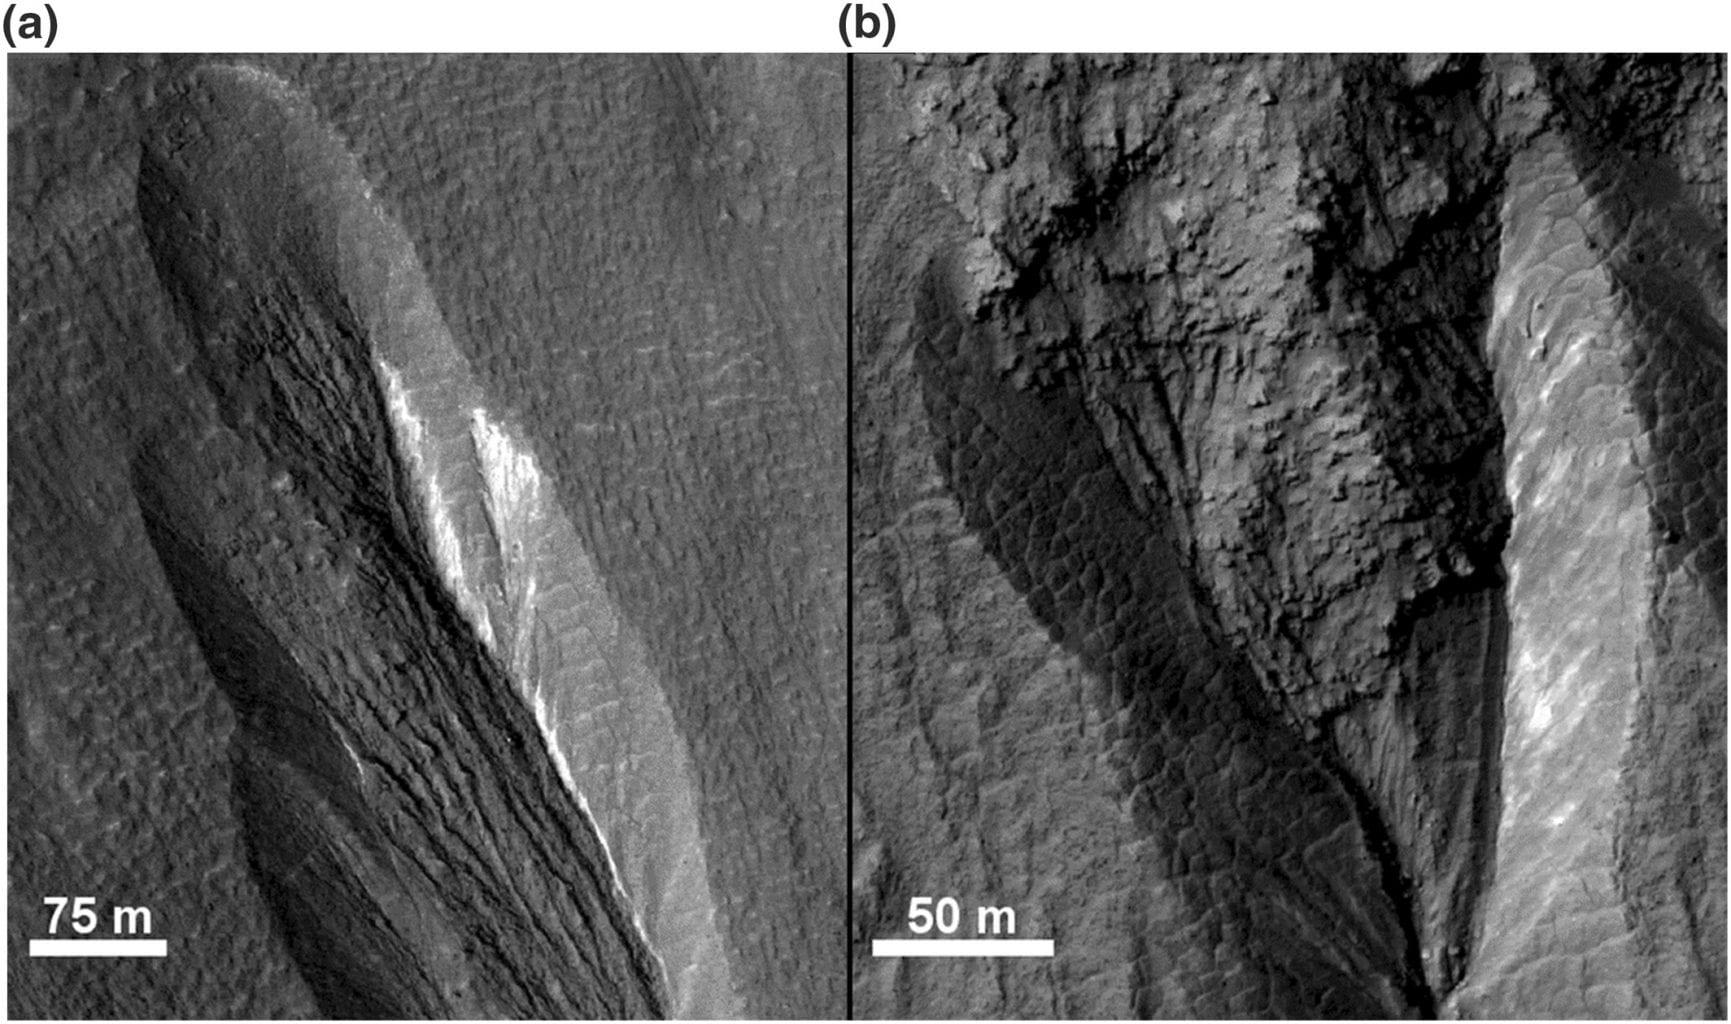 Partially exposed light-toned deposits. Credit: NASA/JPL/University of Arizona